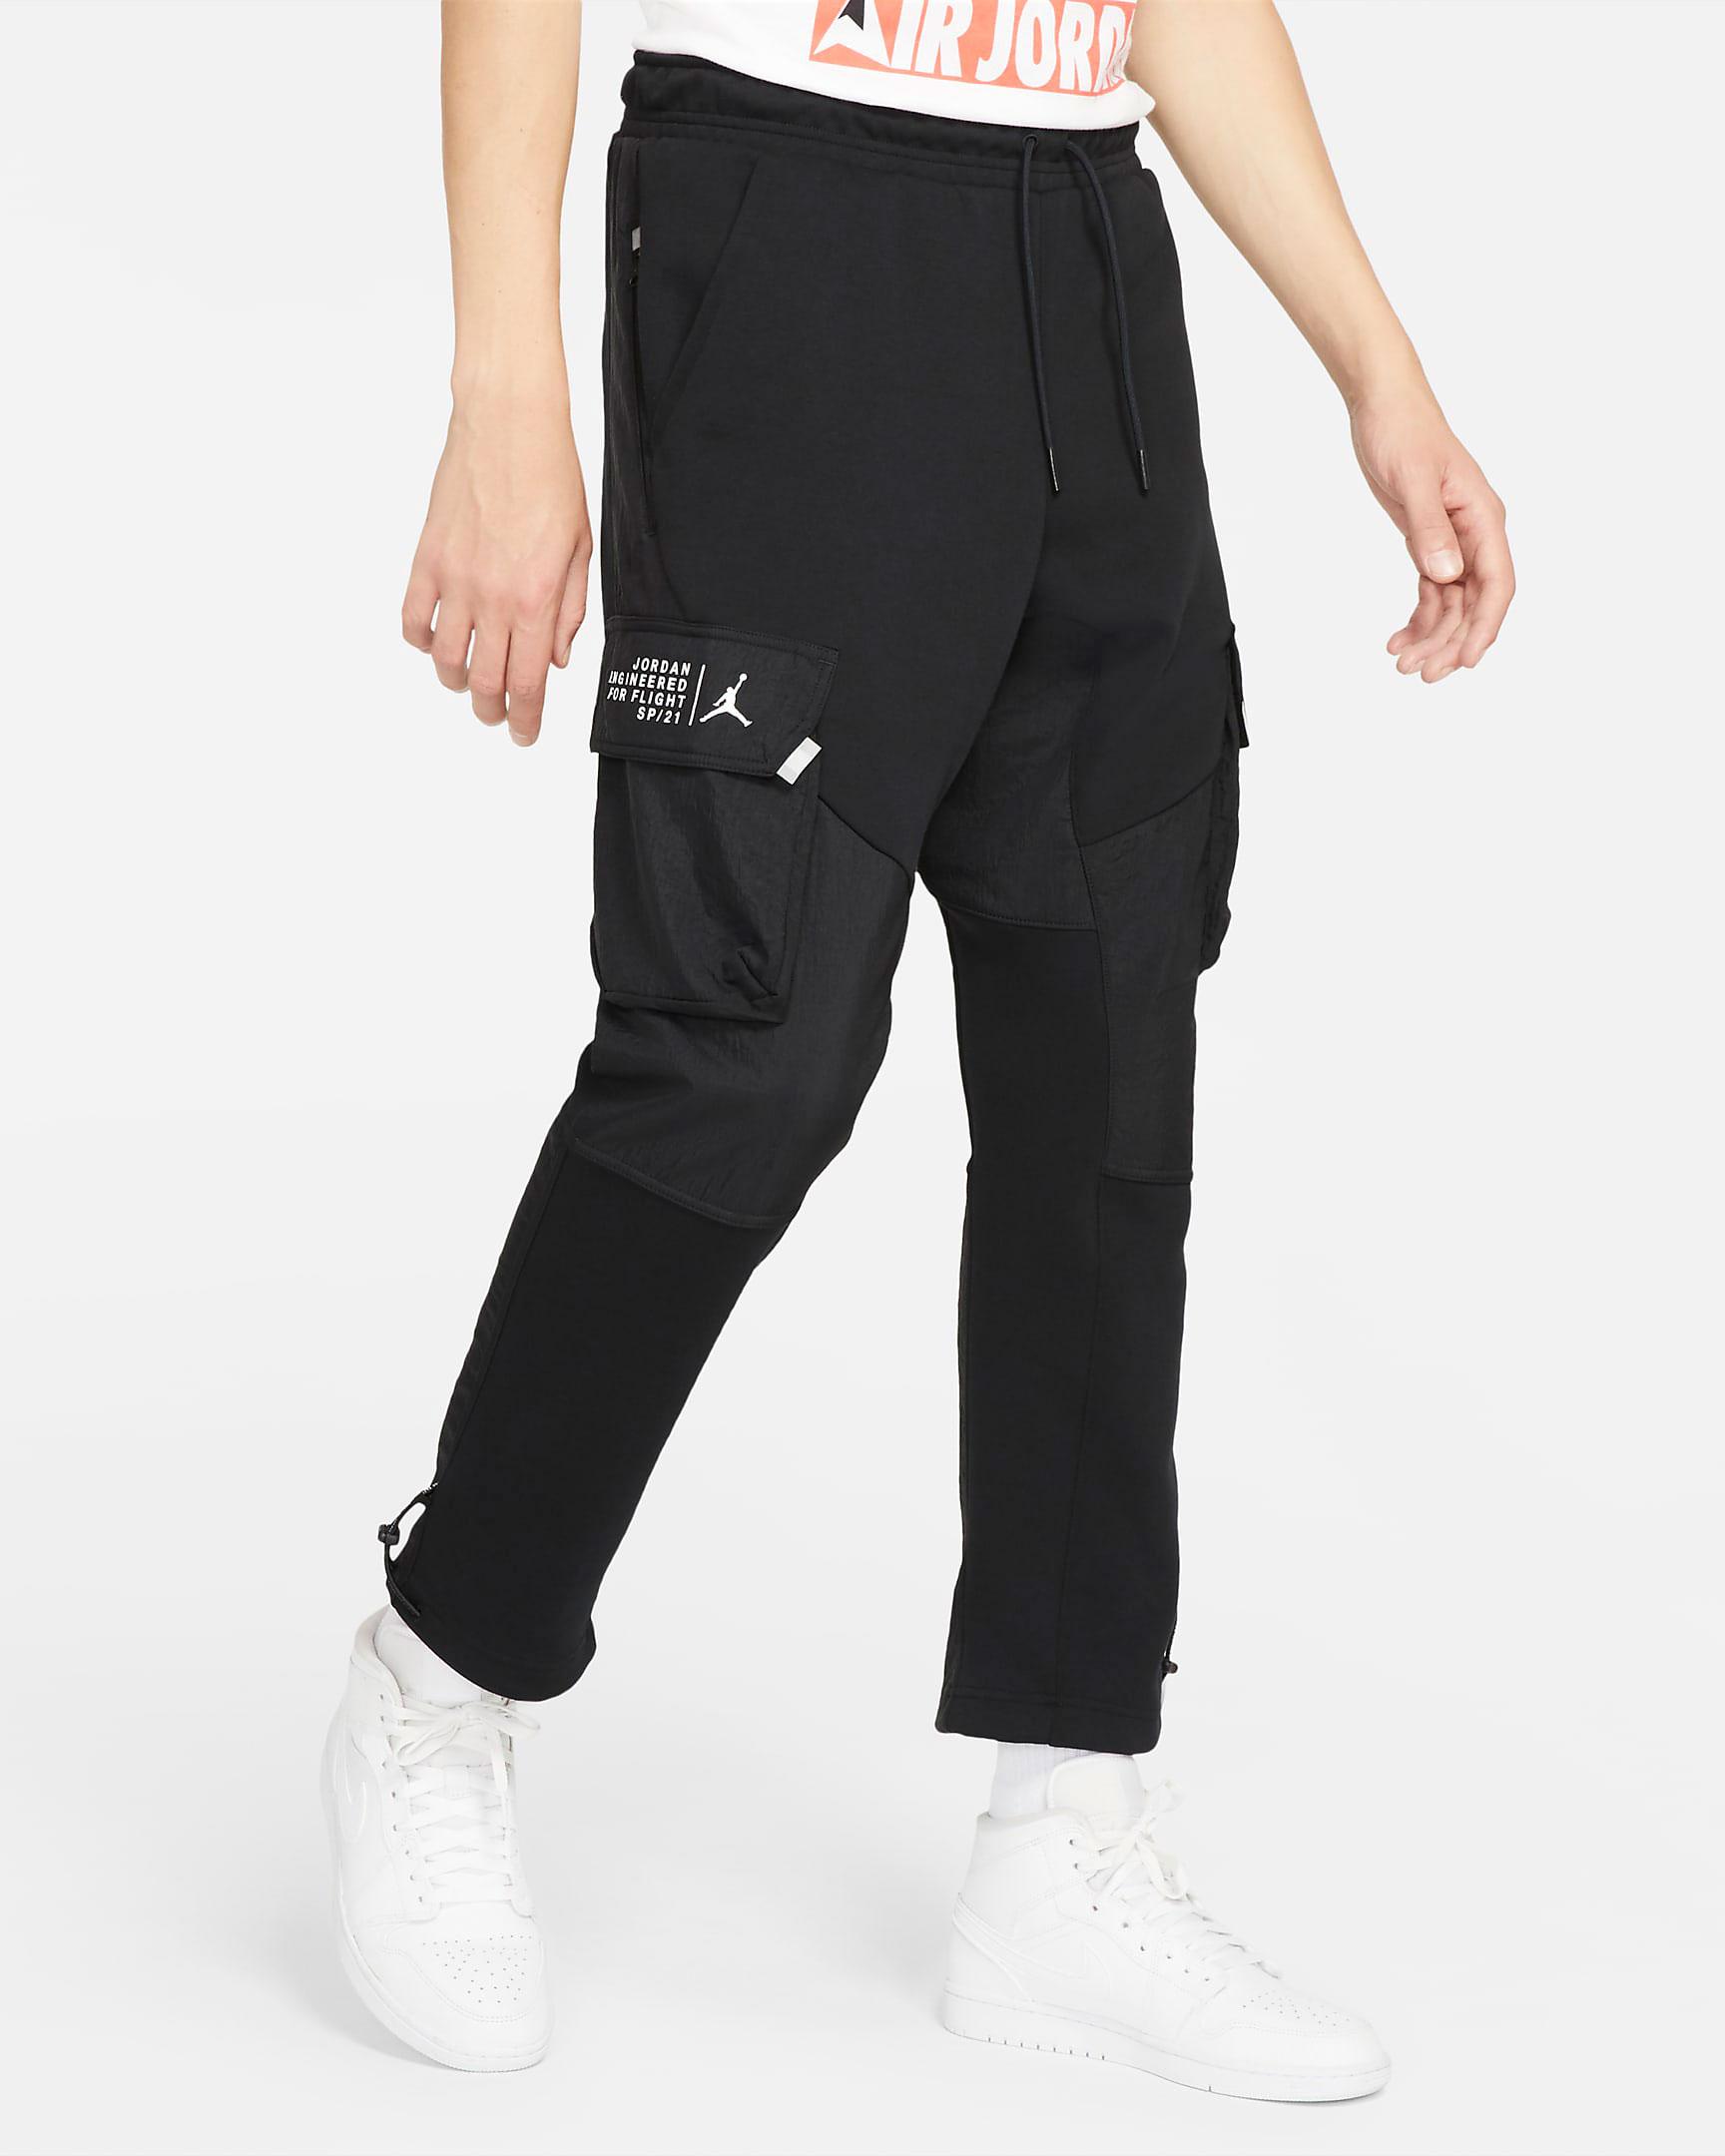 jordan-23-engineered-fleece-cargo-pants-black-white-1